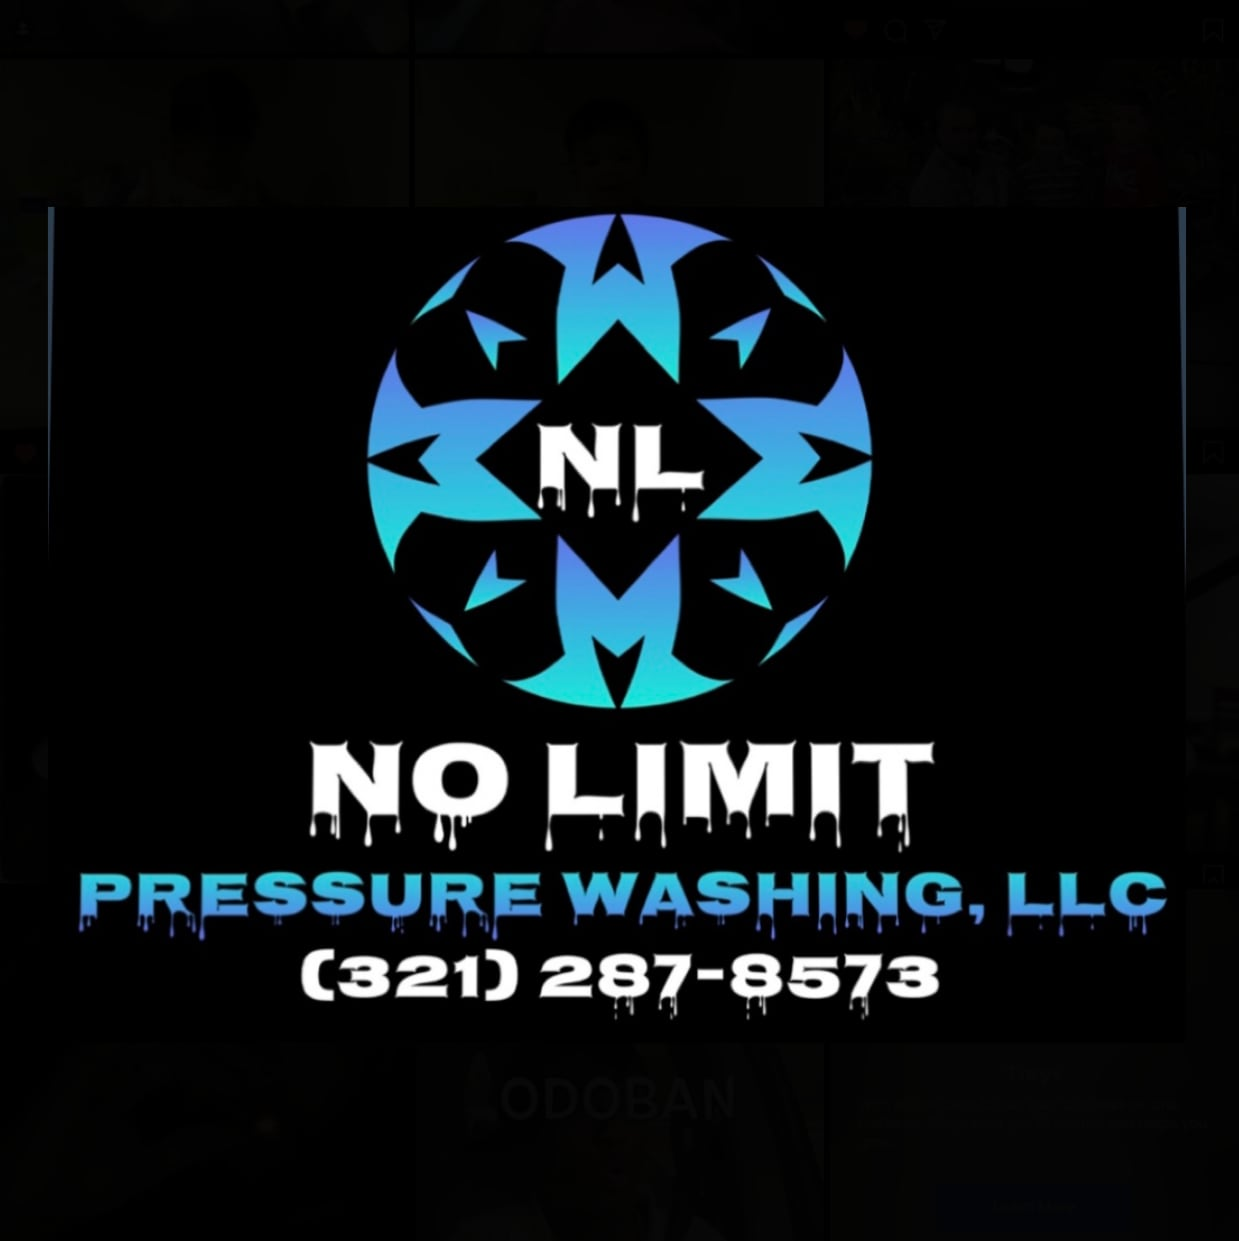 No Limit Pressure Washing, LLC